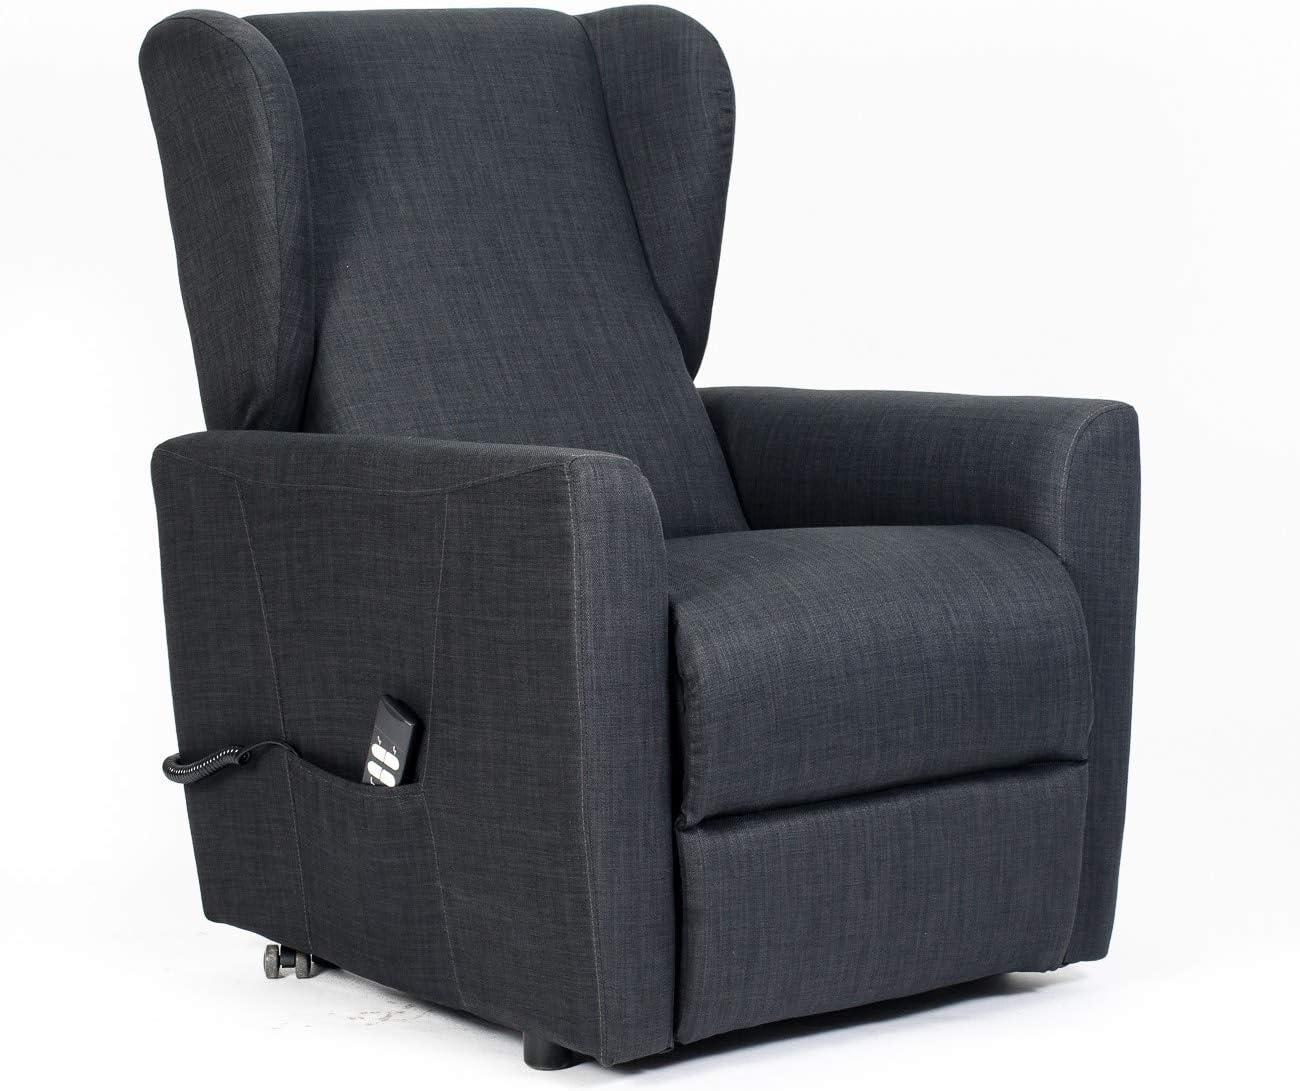 SIME - sillón reclinable eléctrico con 2 Motores Independientes Venta. Shed. Sillón Relax Tercera Edad no válidos Lulu-2M-Blue Night TEBLU CE Médica Tela